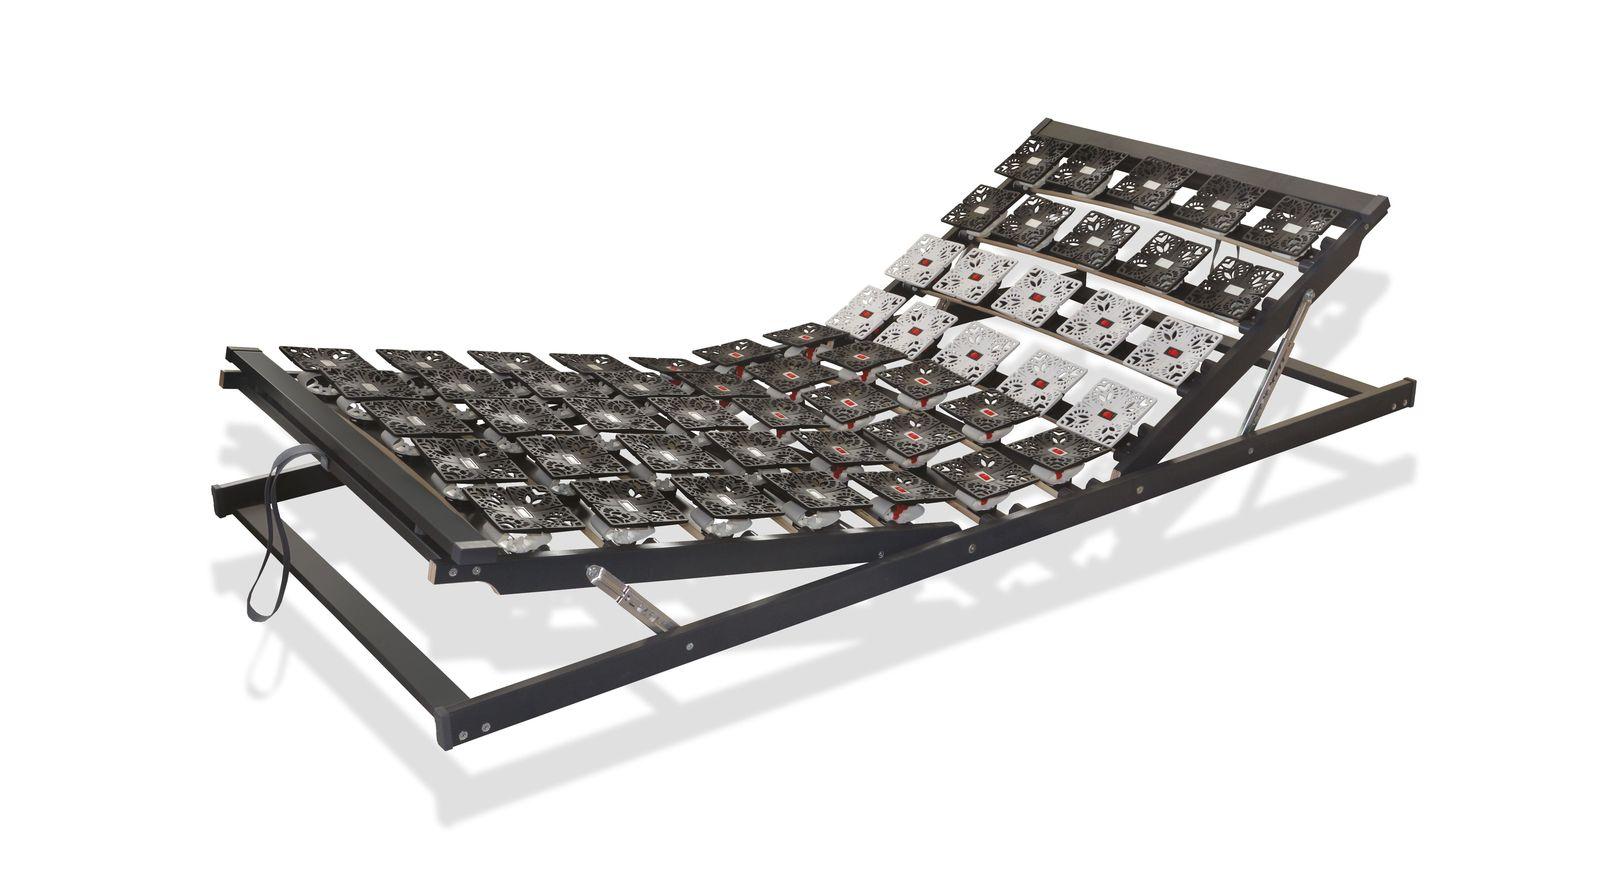 Tellerlattenrost youSleep mit flexibel gelagerten Tellermodulen